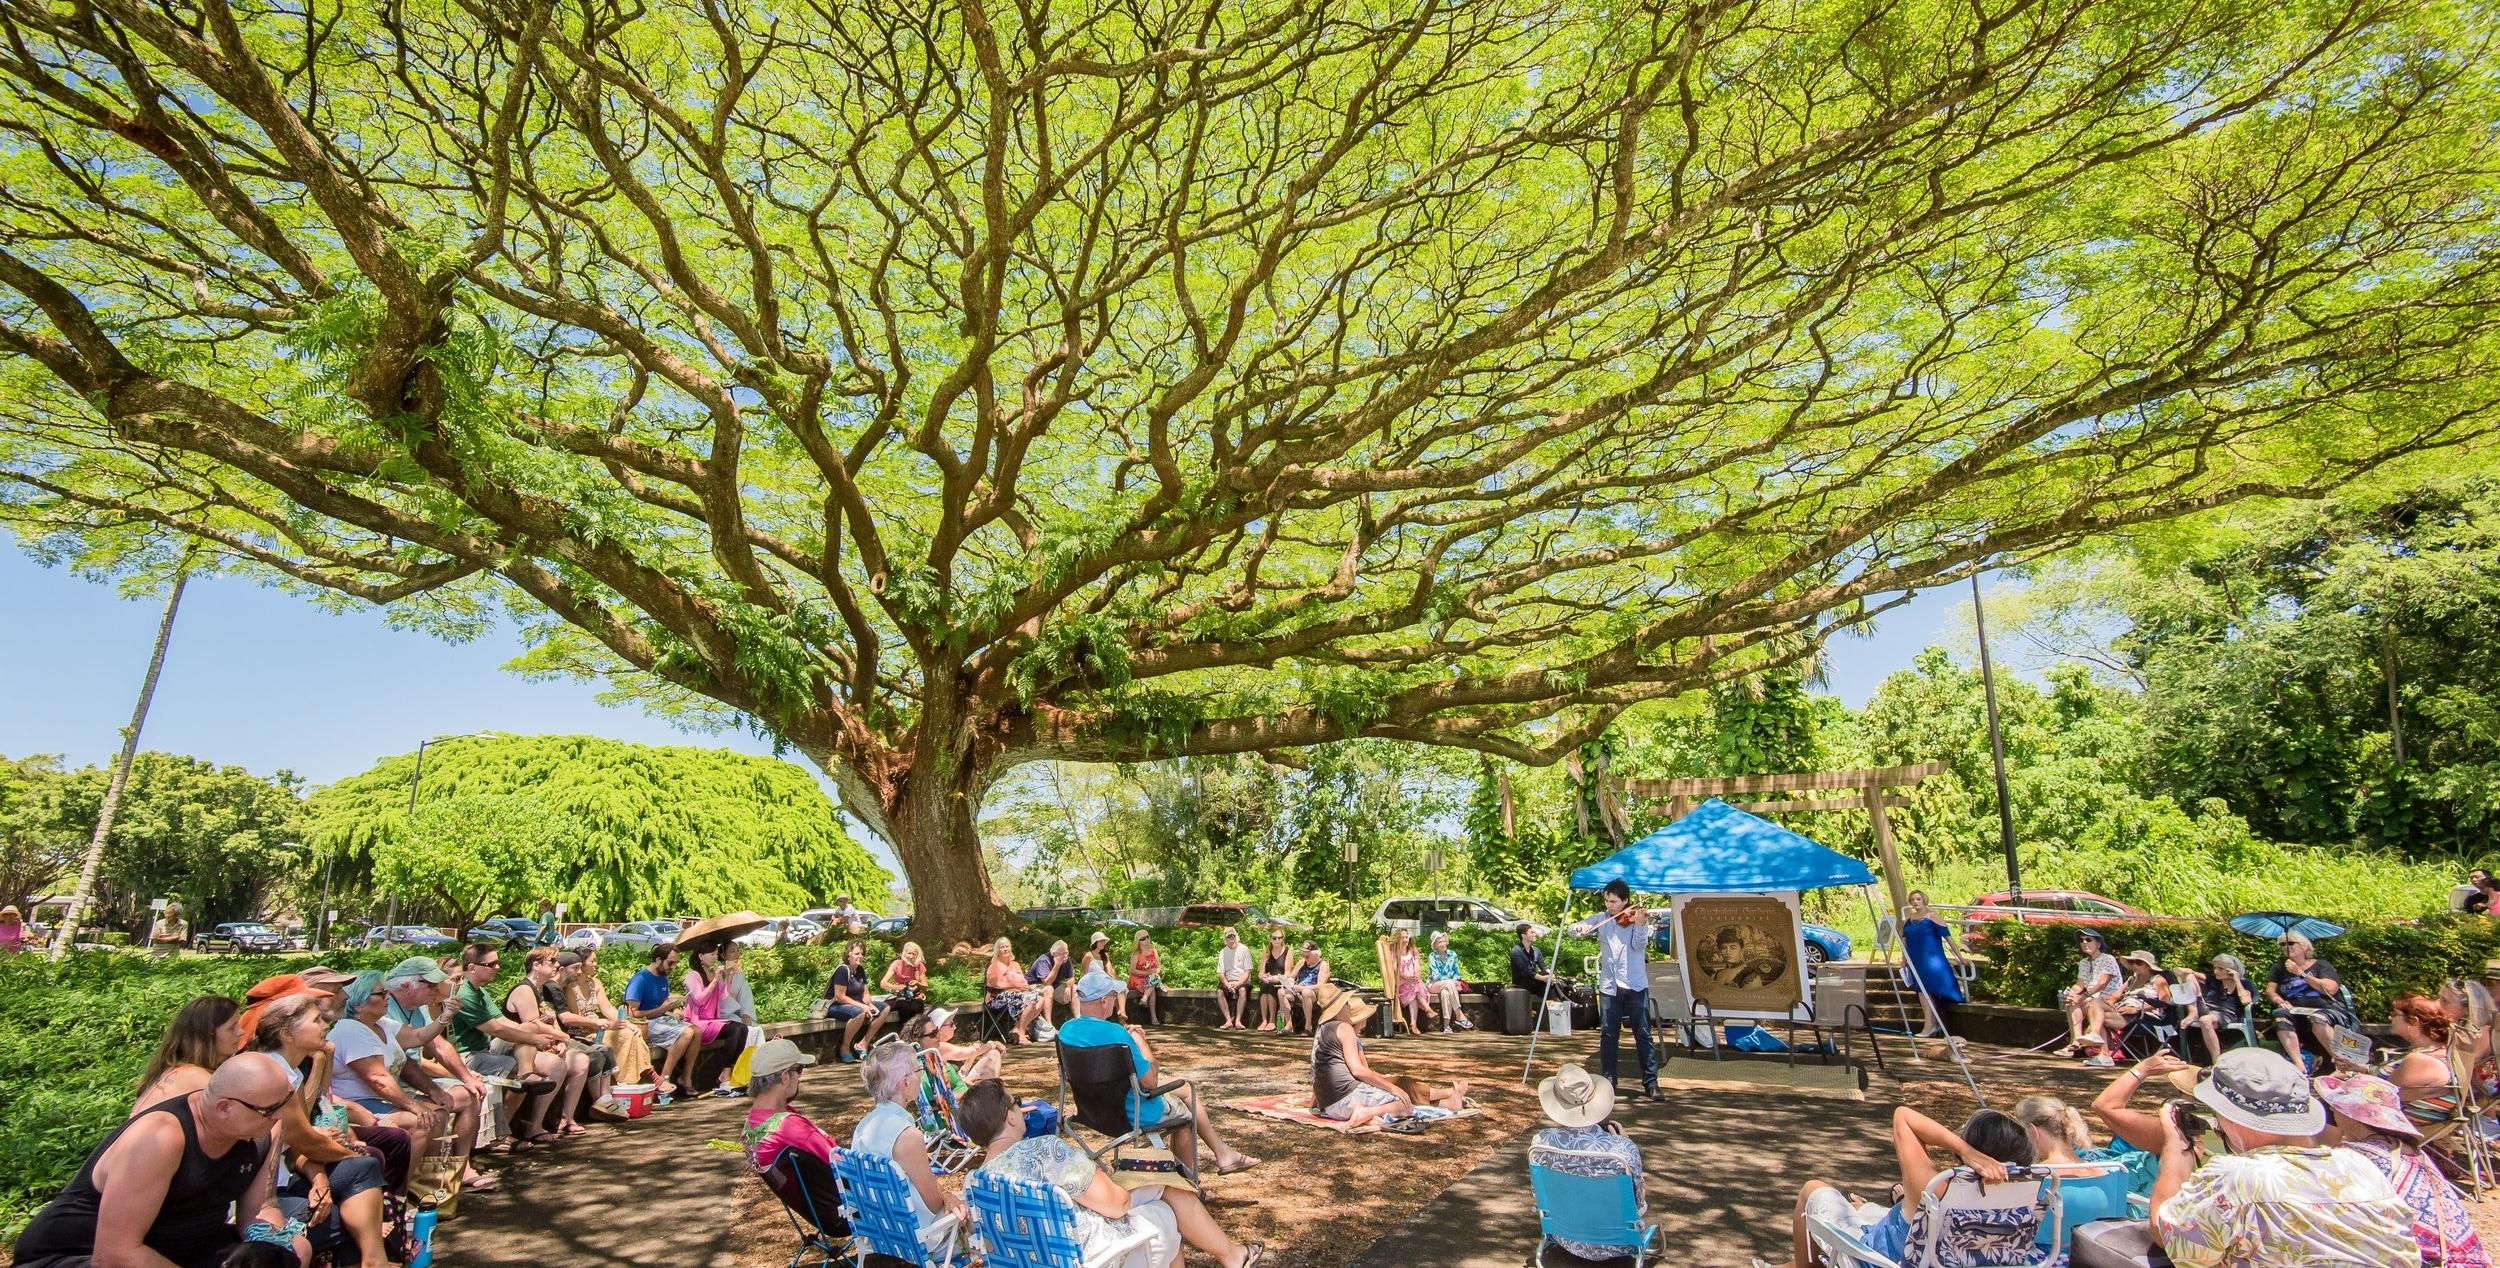 Free concert at the Lili'uokalani Botanical Gardens